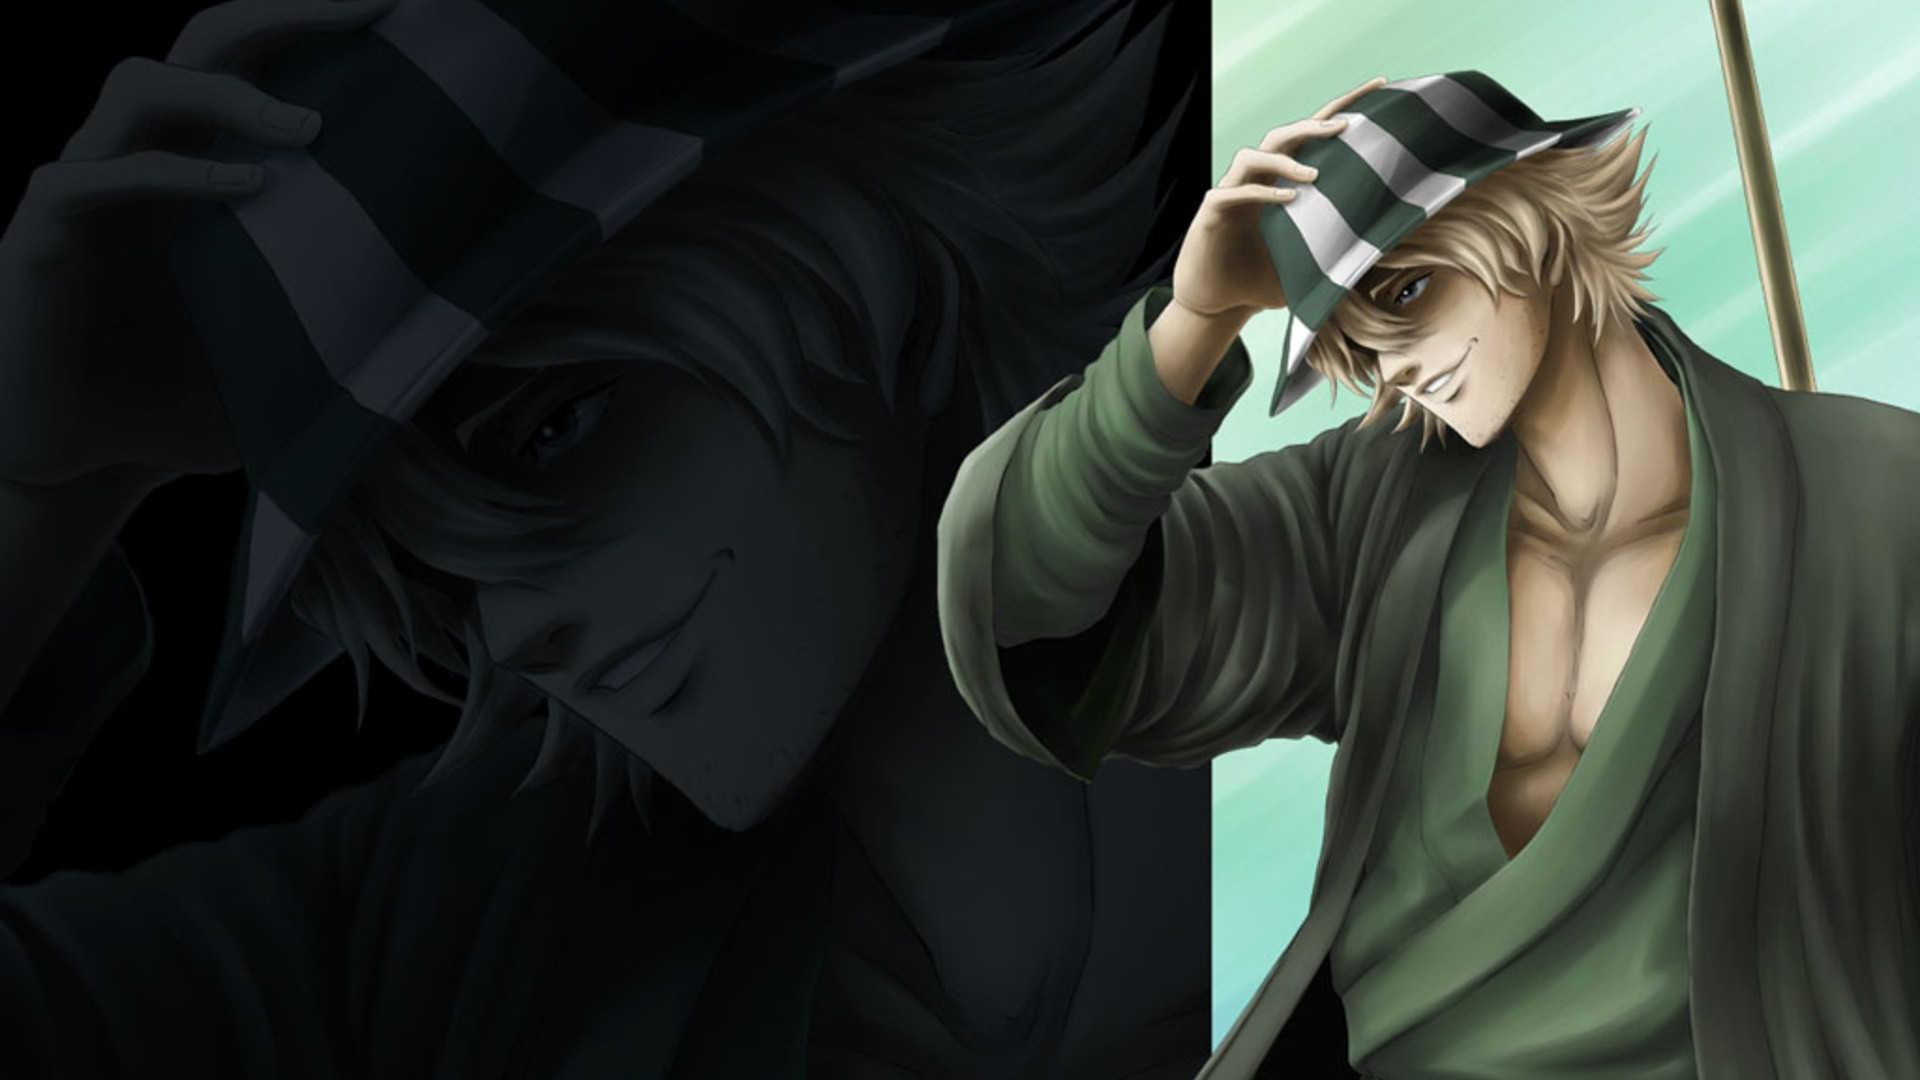 Ichigo Kurosaki Bleach Shinigami Anime Hd Background Wallpaper Art